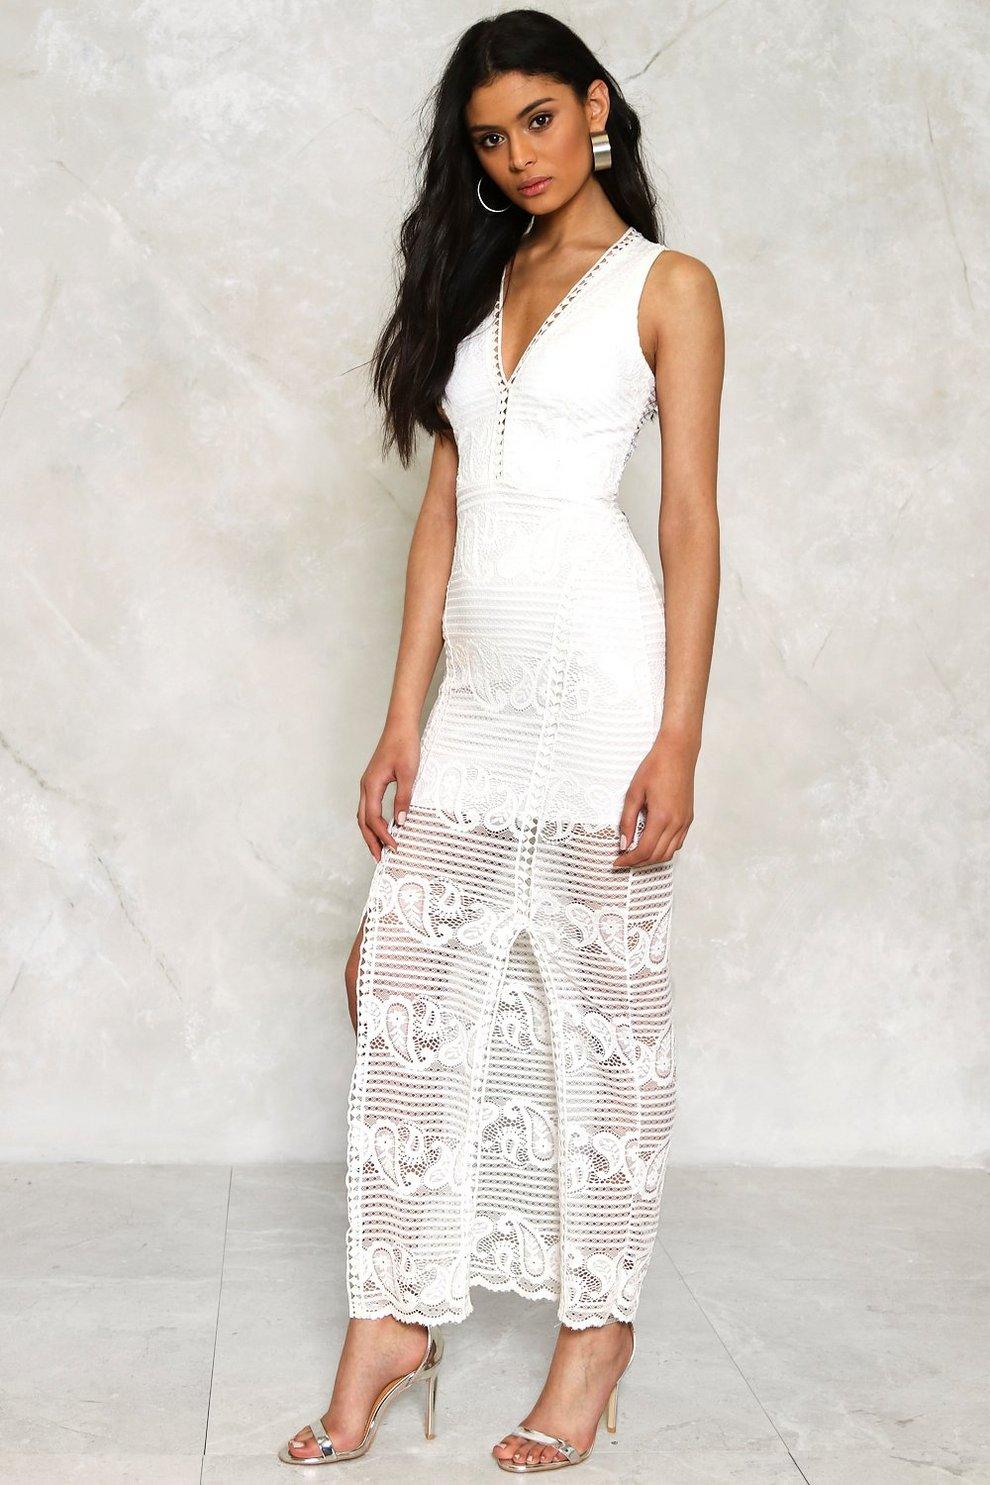 27cba7f7121a0 Emilia Crochet Lace Dress | Shop Clothes at Nasty Gal!